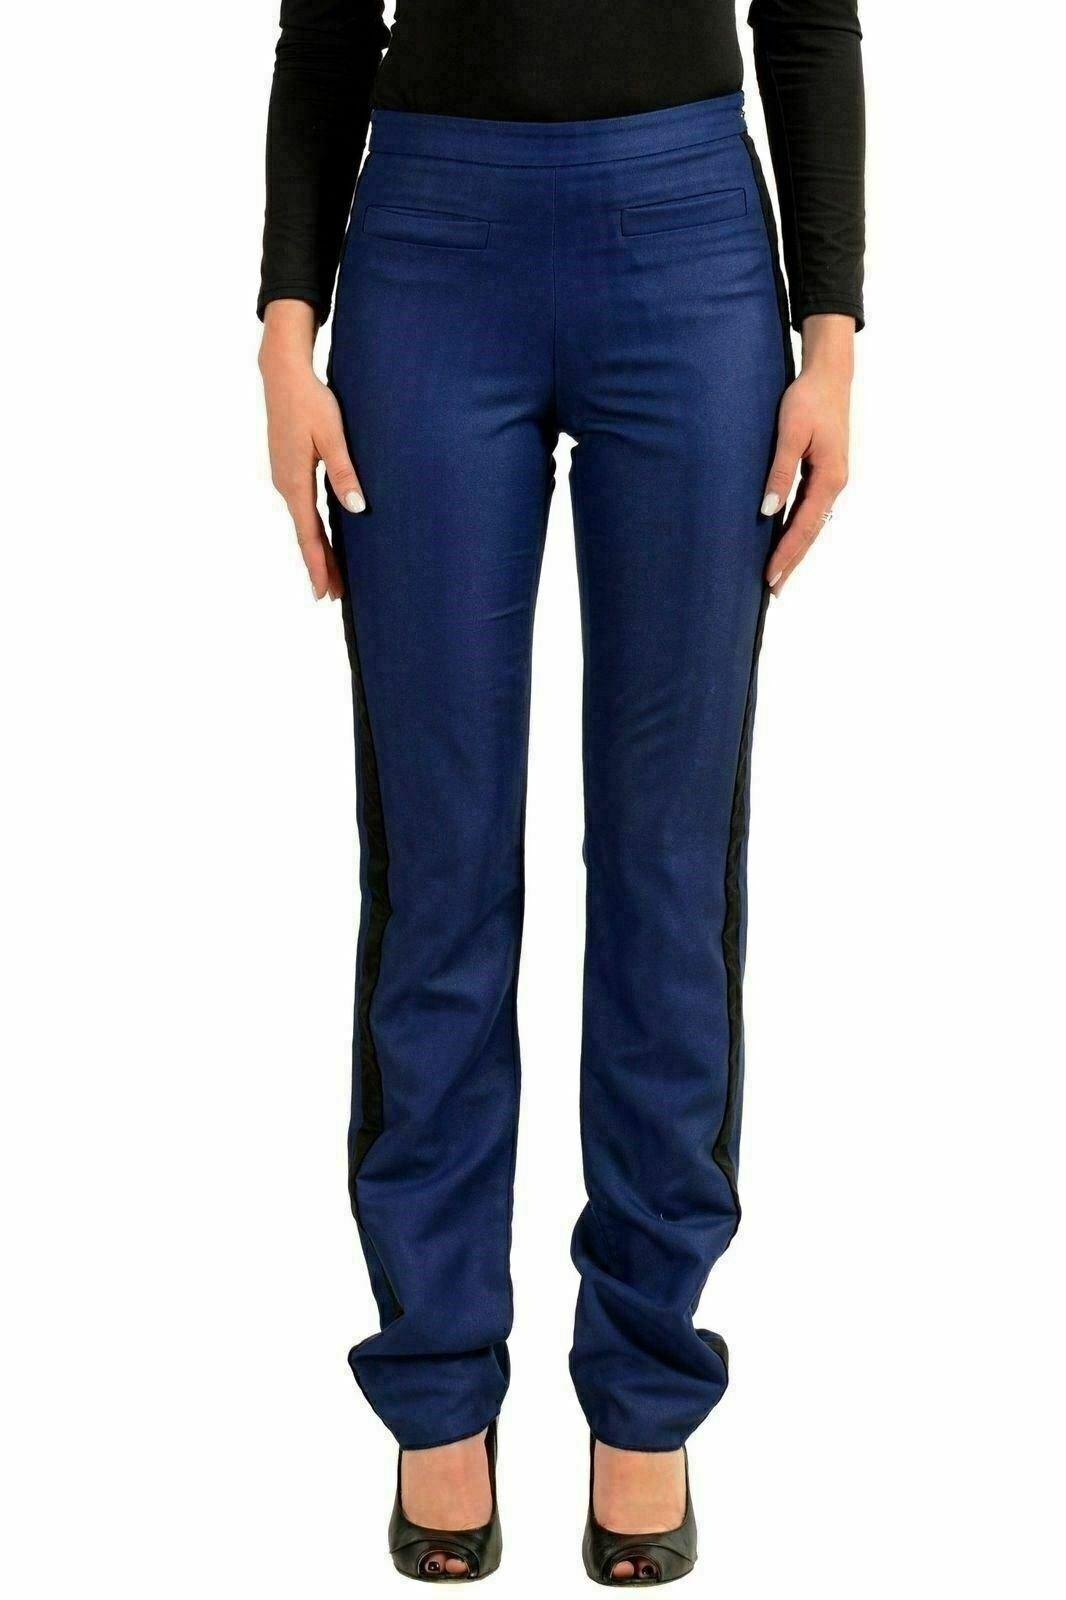 Just Cavalli Damen Blau Freizeithose